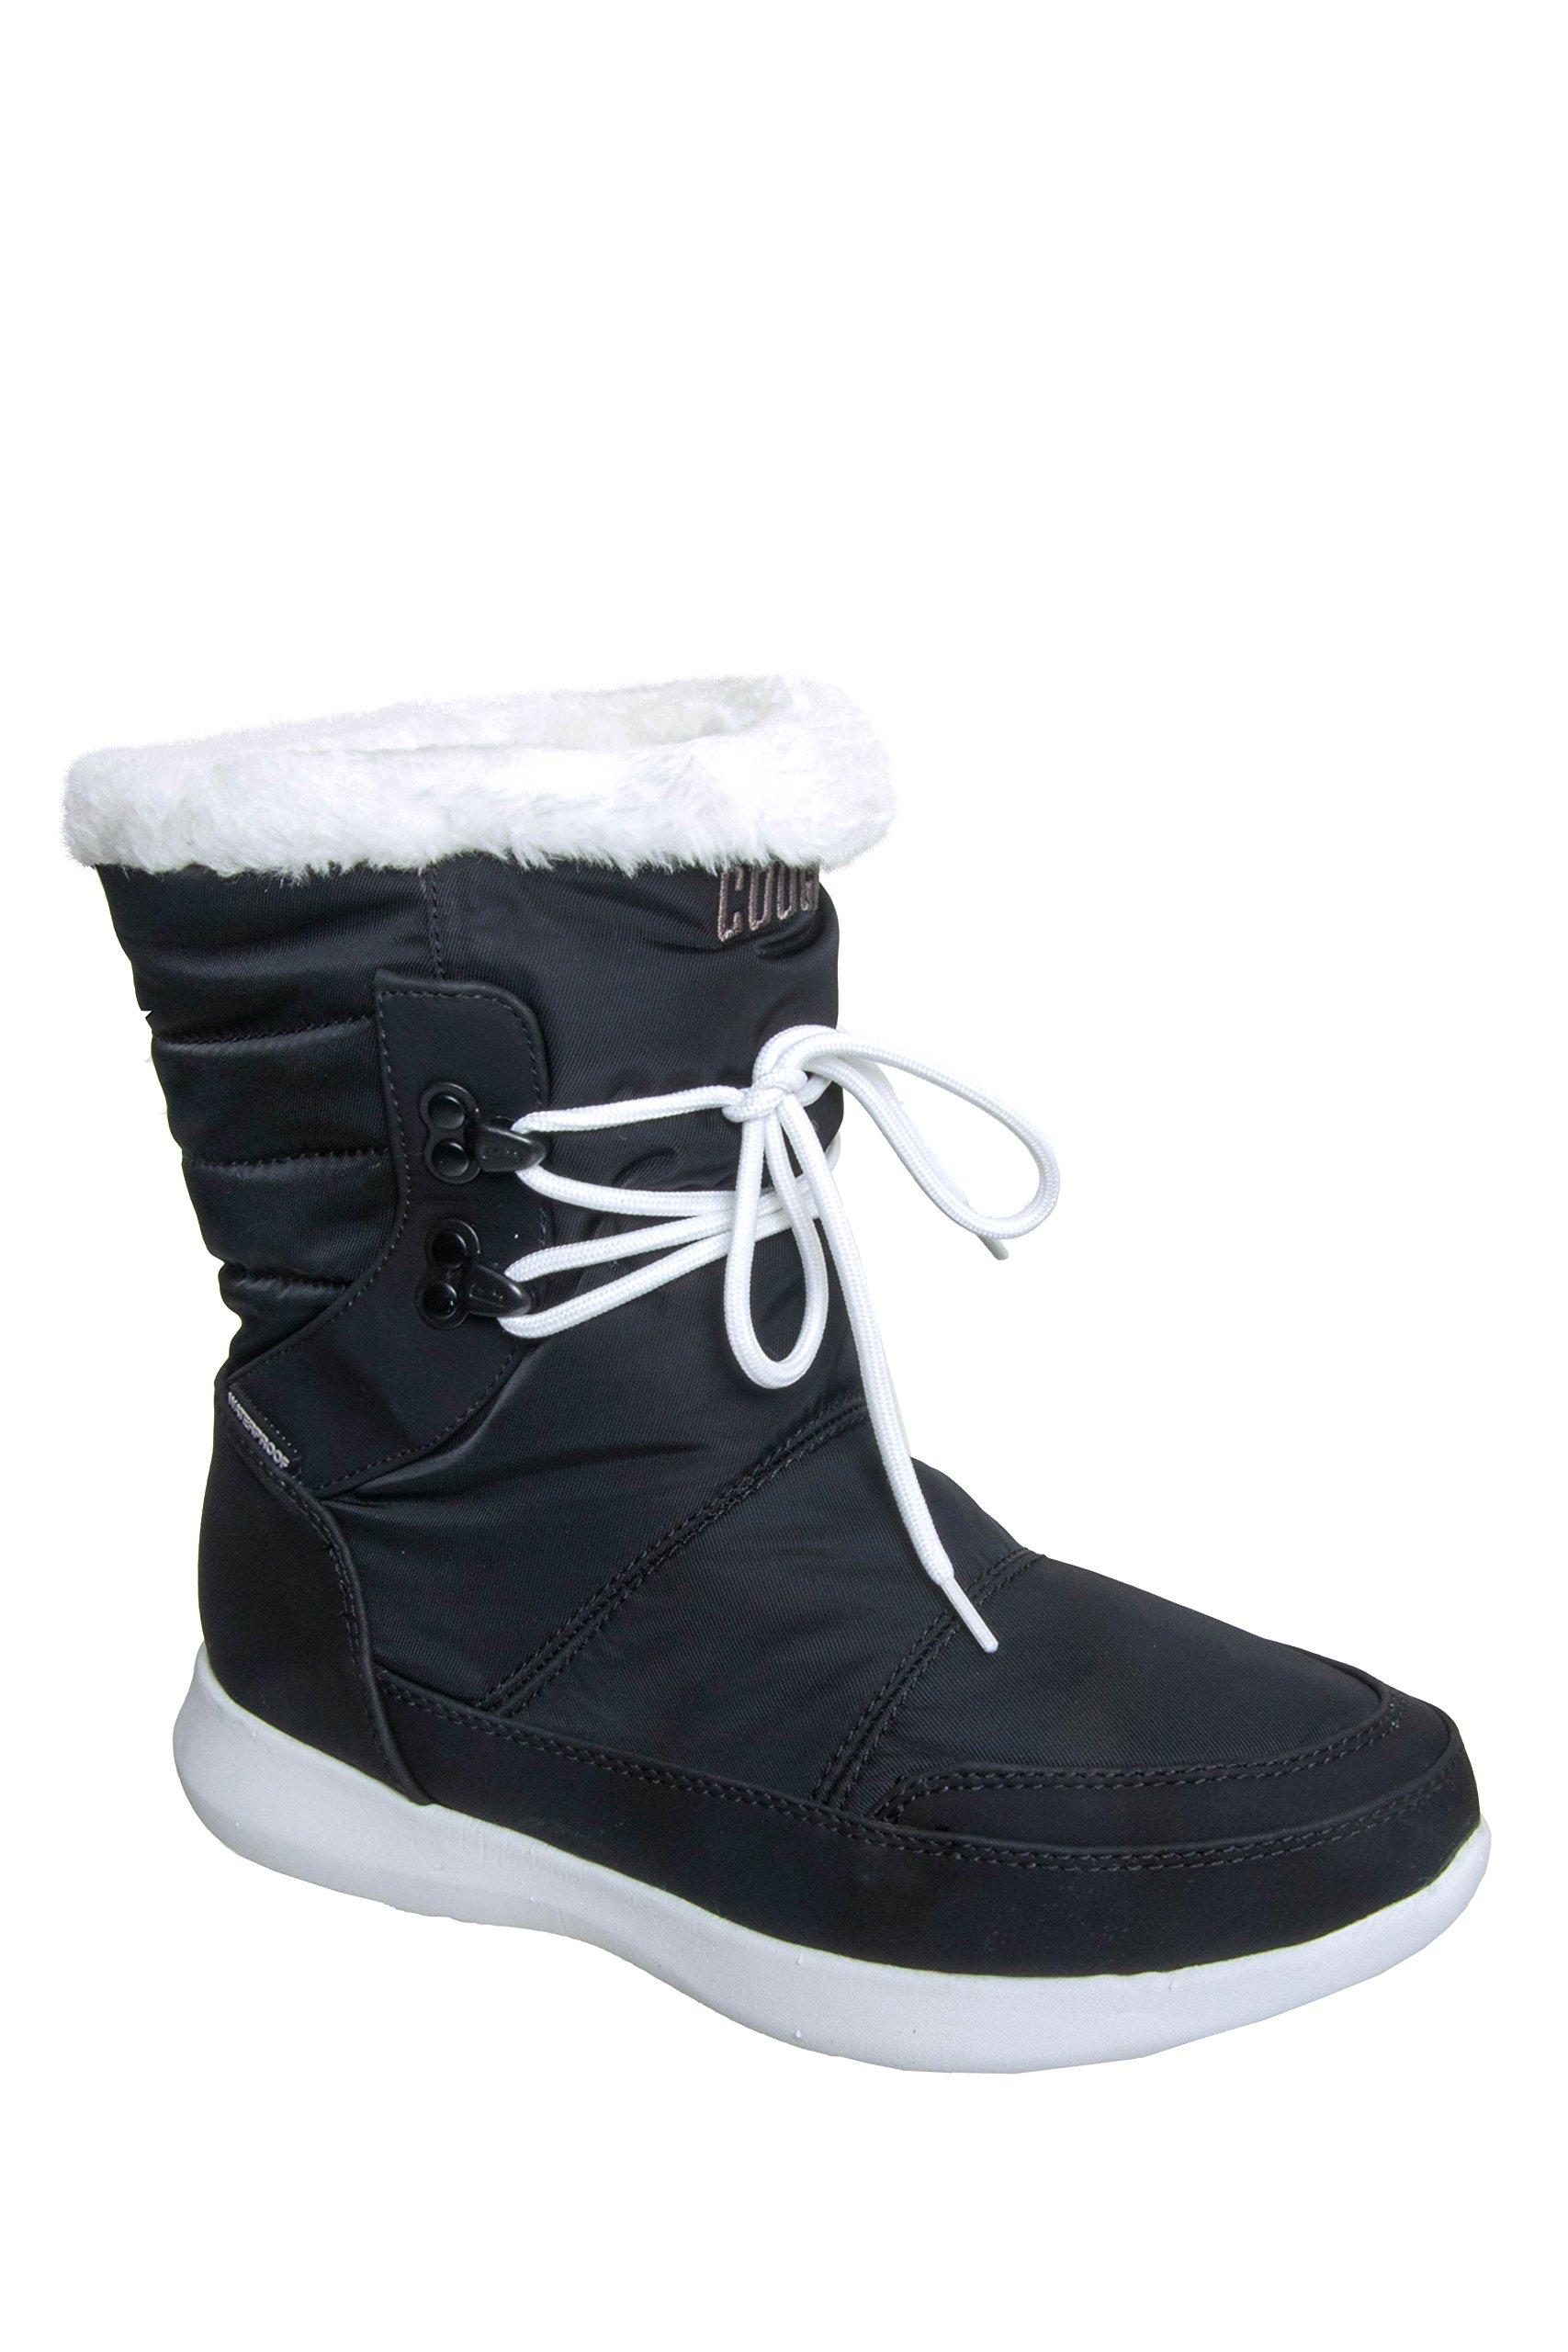 Cougar Women's Wonder Waterproof Winter Boot Black 10 M US